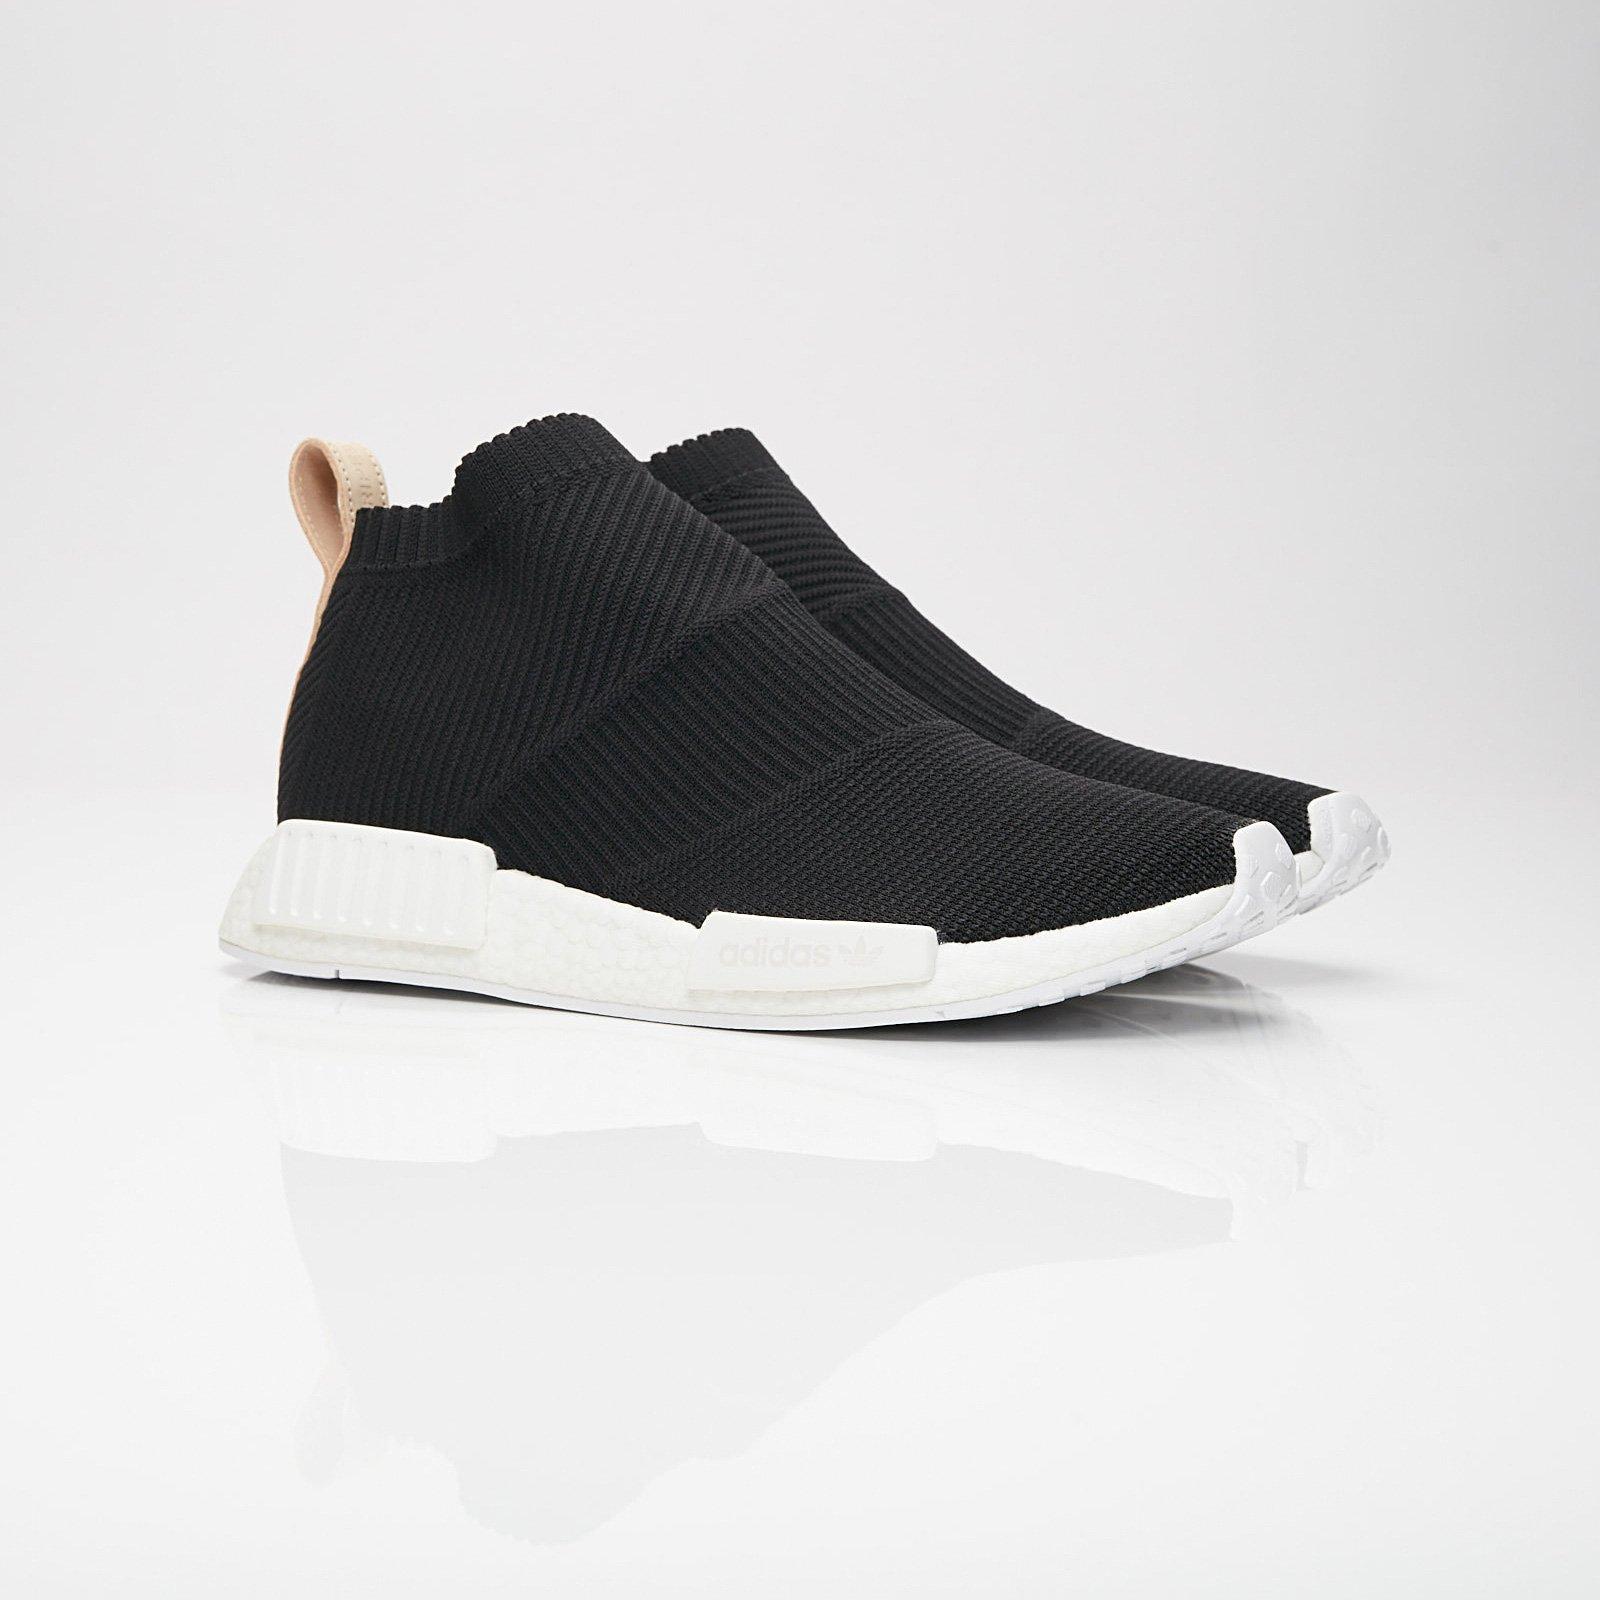 detailed look 7dd33 d72f4 adidas Originals Nmd Cs1 Pk